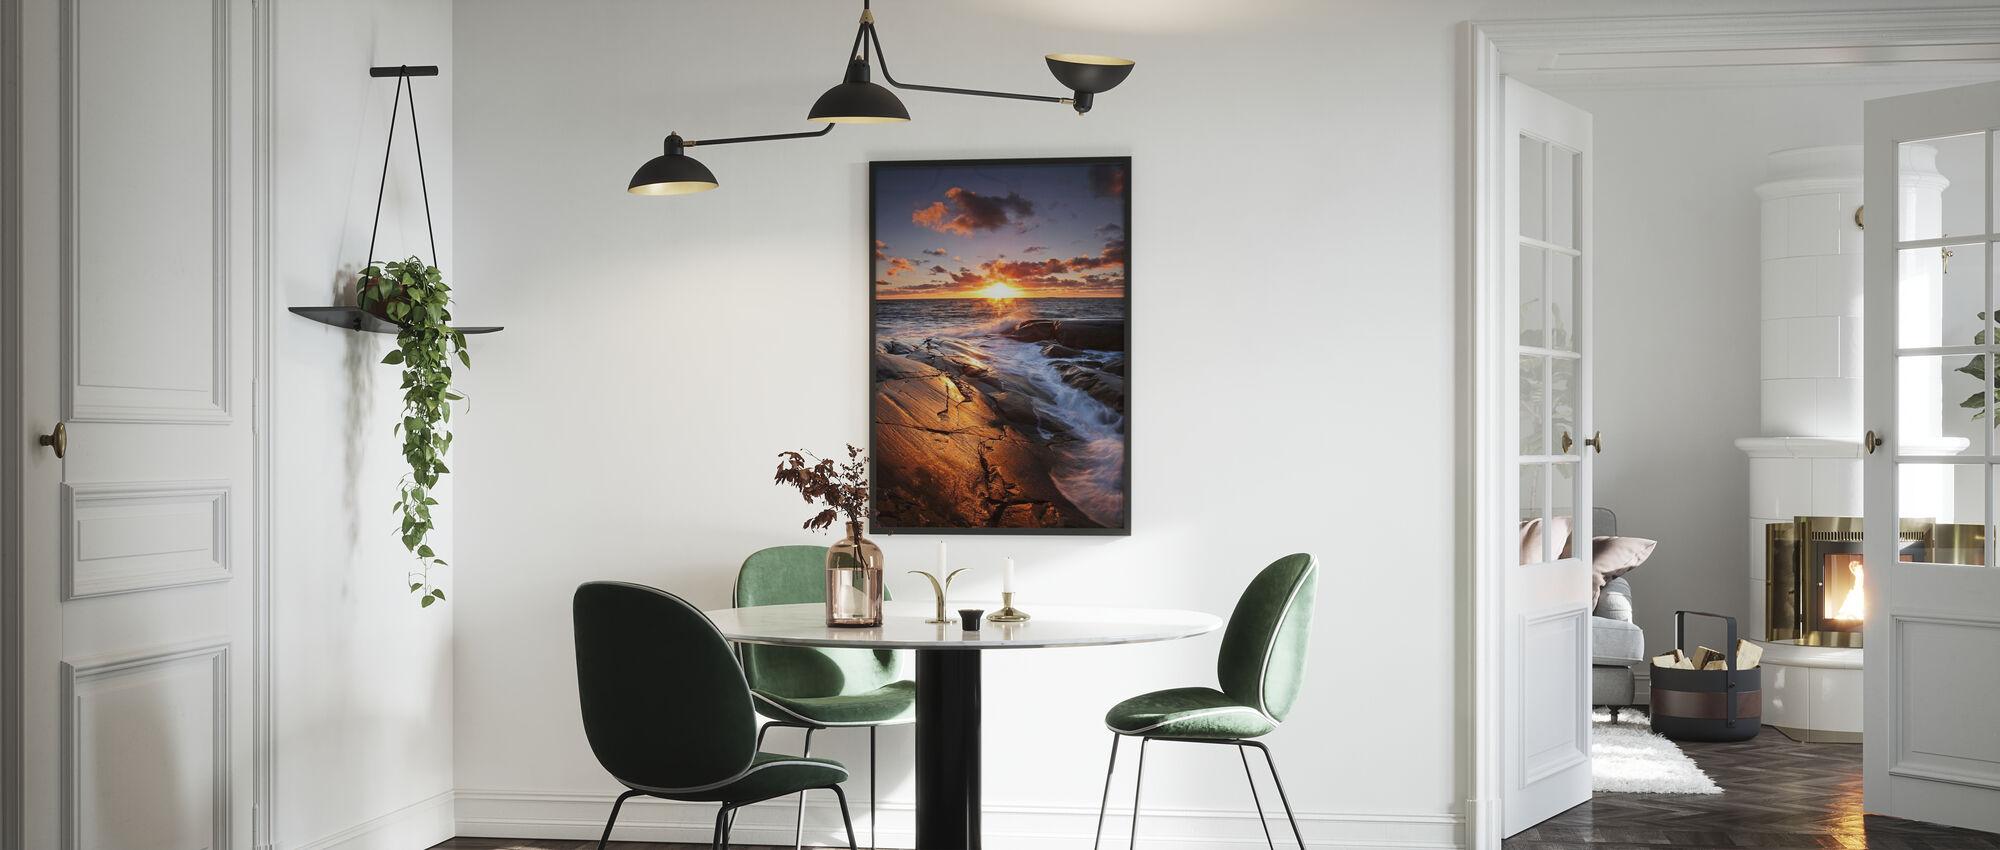 The Golden Rock - Poster - Kitchen